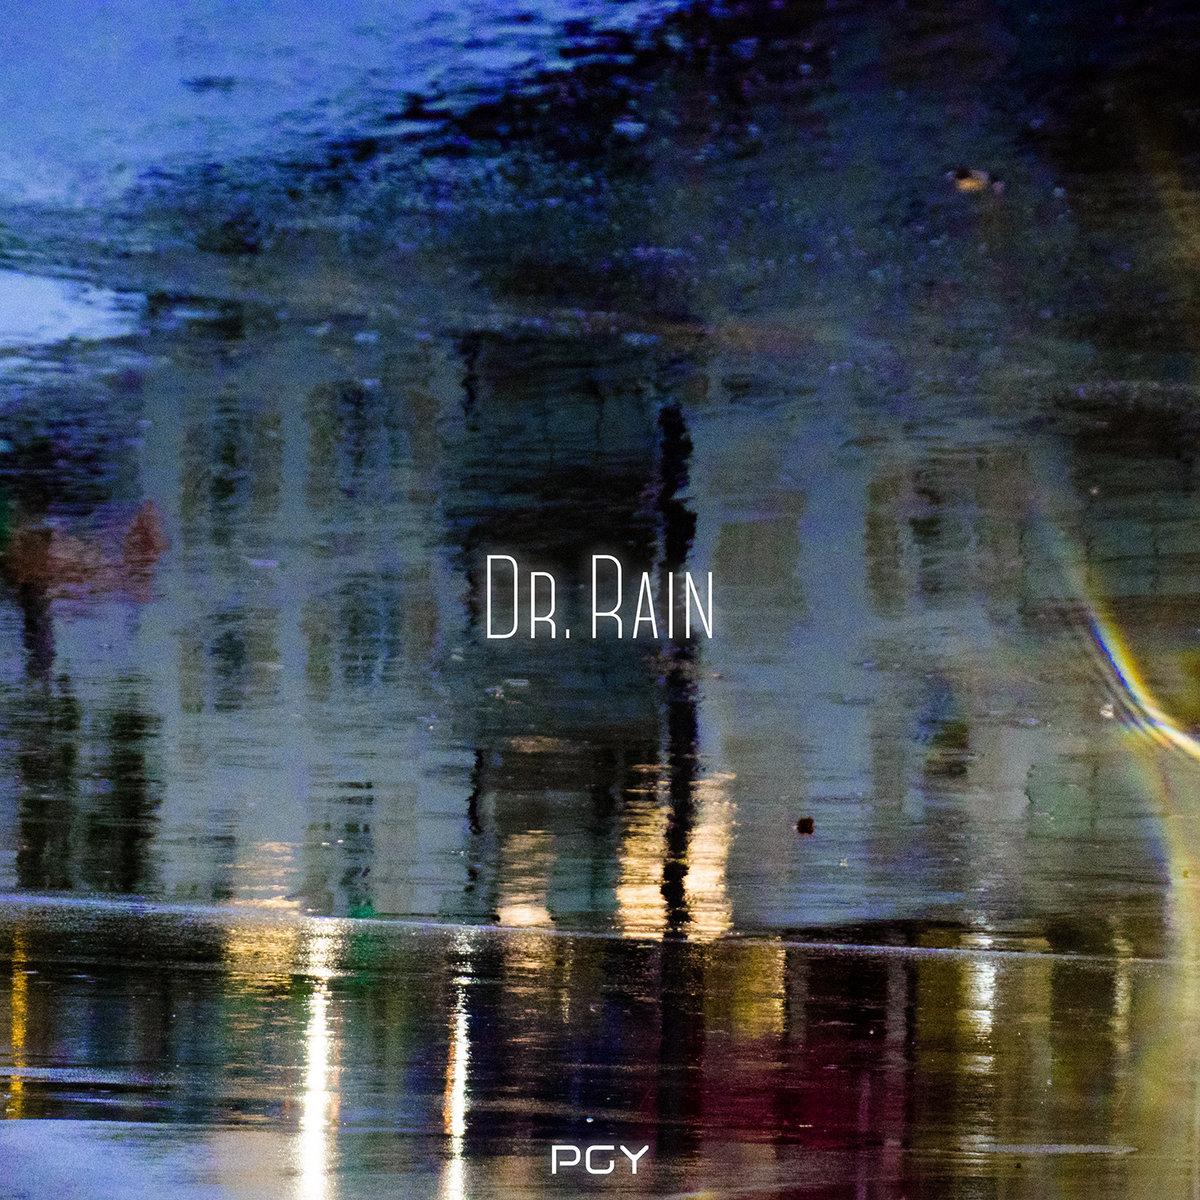 wilde 2 zeiten kostenlos runterladen single rain singles  ARTY discusses new single 39;Rain,39; electronic music, future plans America39;s Heaviest Rainfall Records, The Weather Channel.